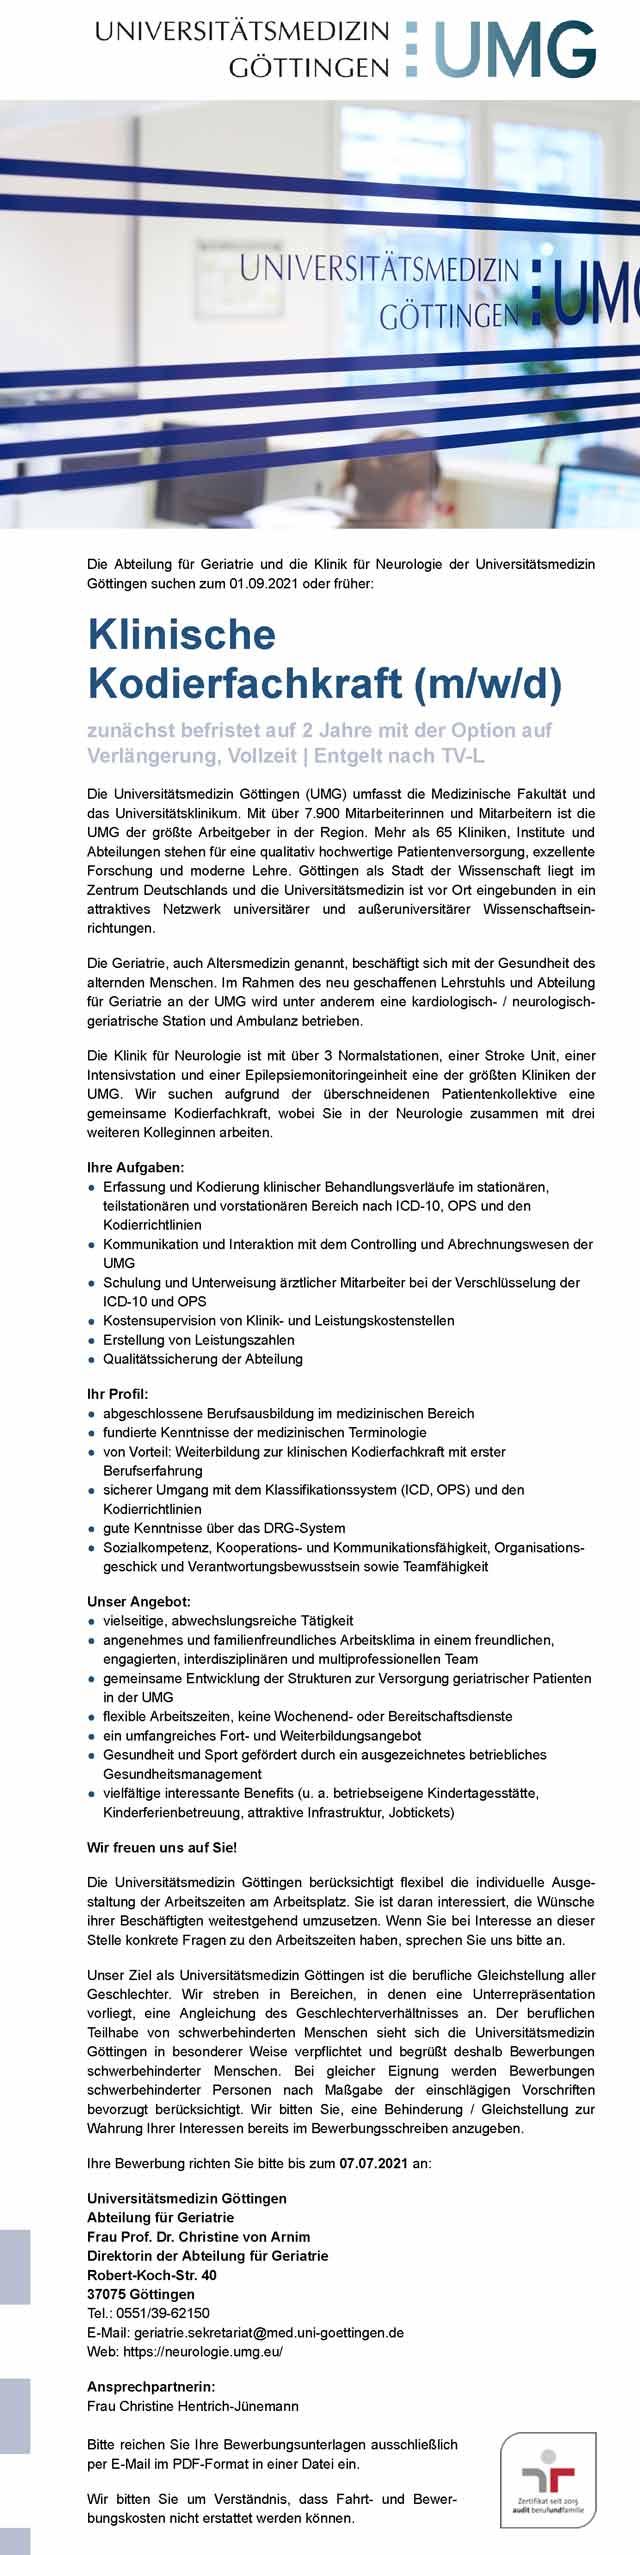 Universitätsmedizin Göttingen: Klinische Kodierfachkraft (m/w/d)